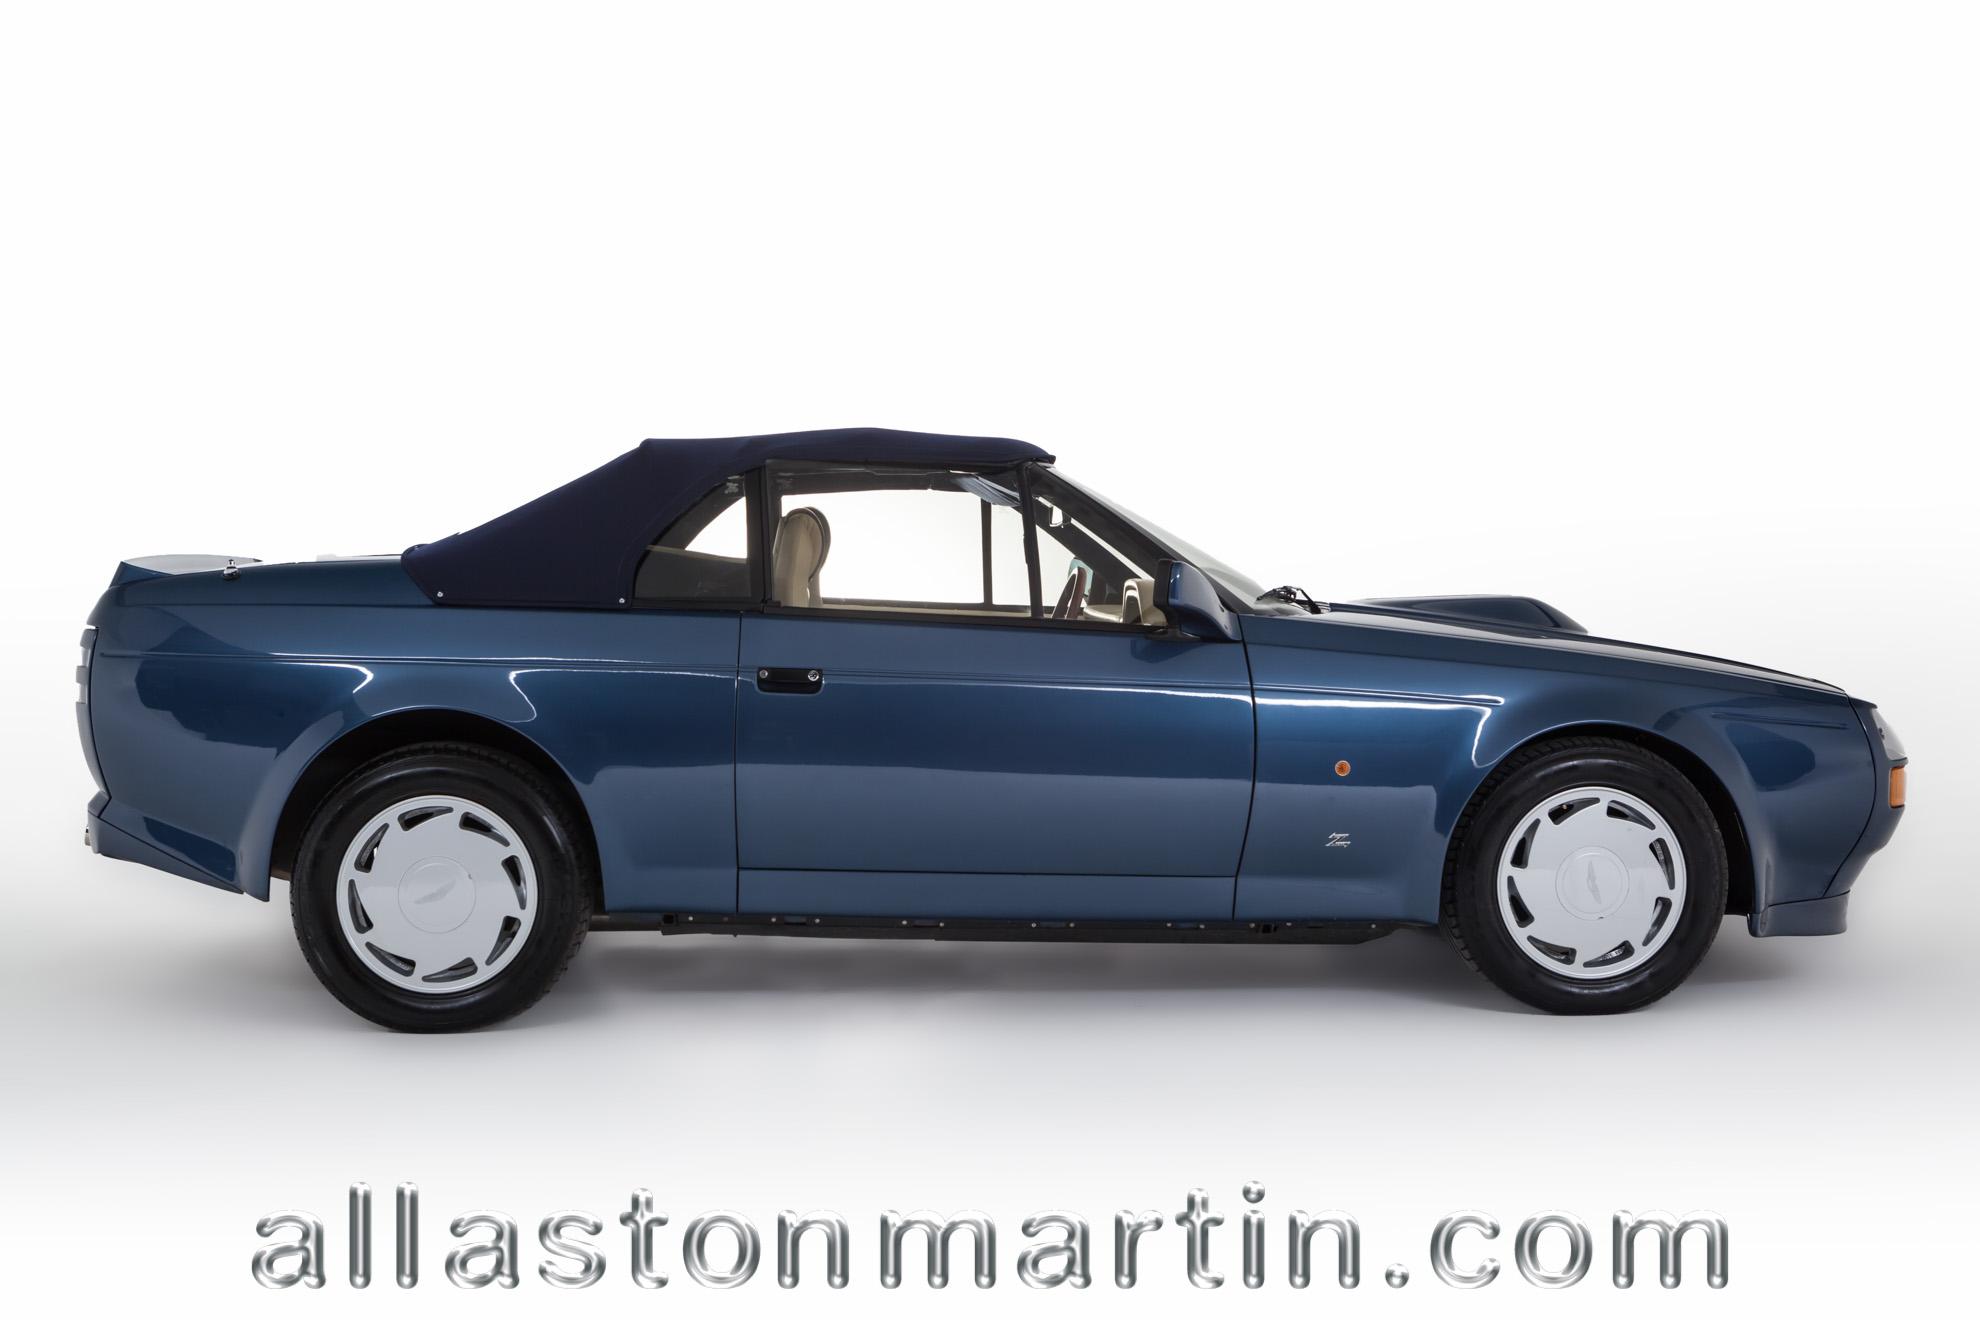 New 928 Intake Plan Based On Aston Martin V8 Vantage Wiring Diagram Oil Filter Diagrams Repair